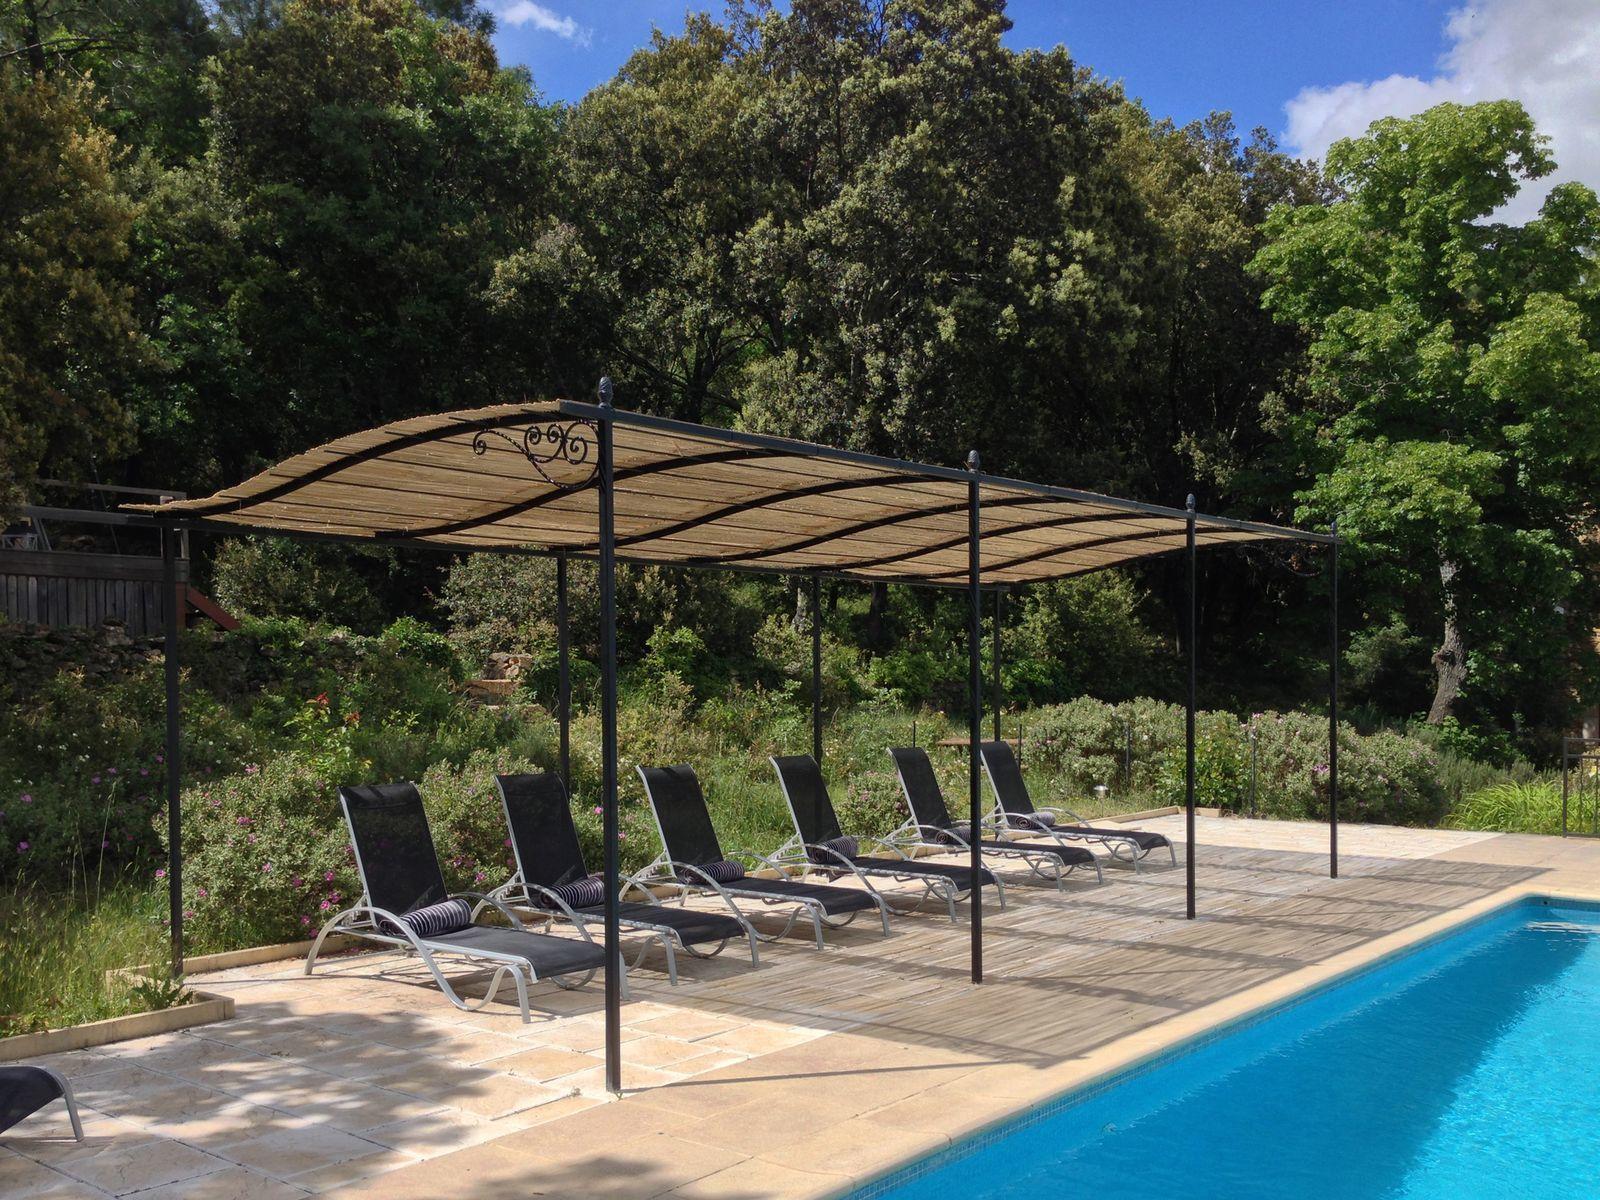 Le Paradis - safaritent Zuid-Frankrijk luxe kamperen